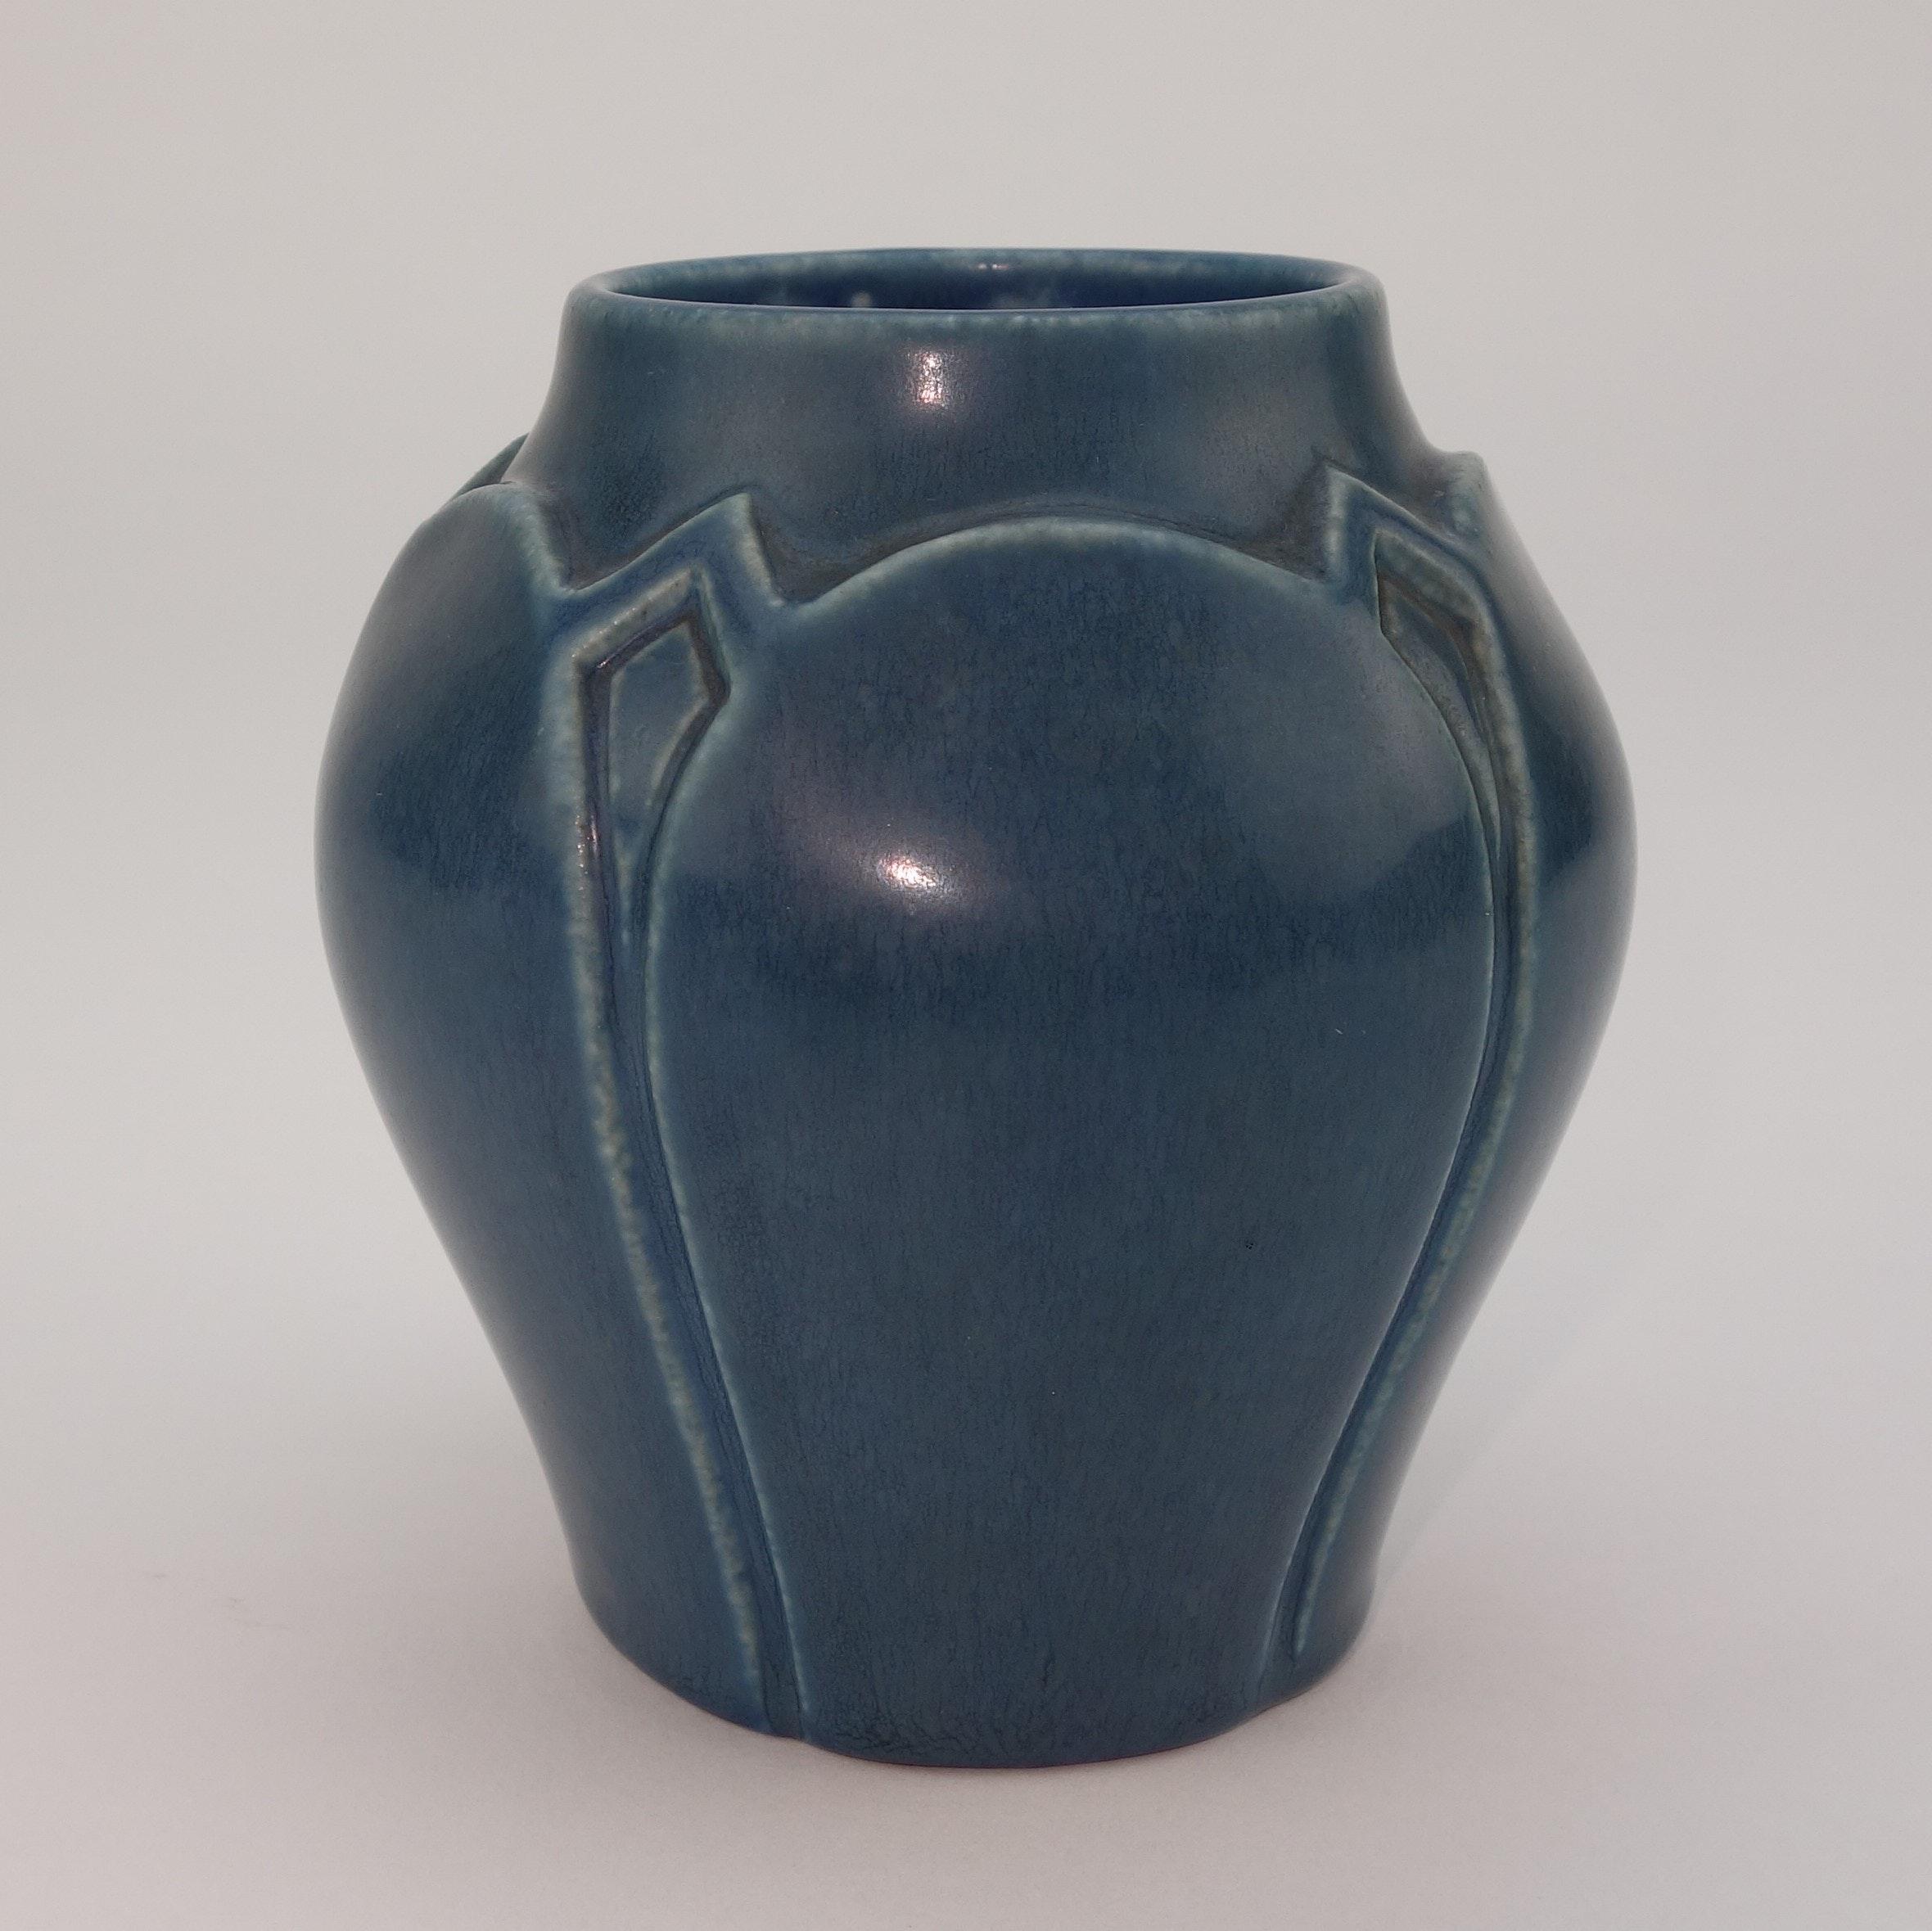 1921 Rookwood Art Pottery Frogskin Vase